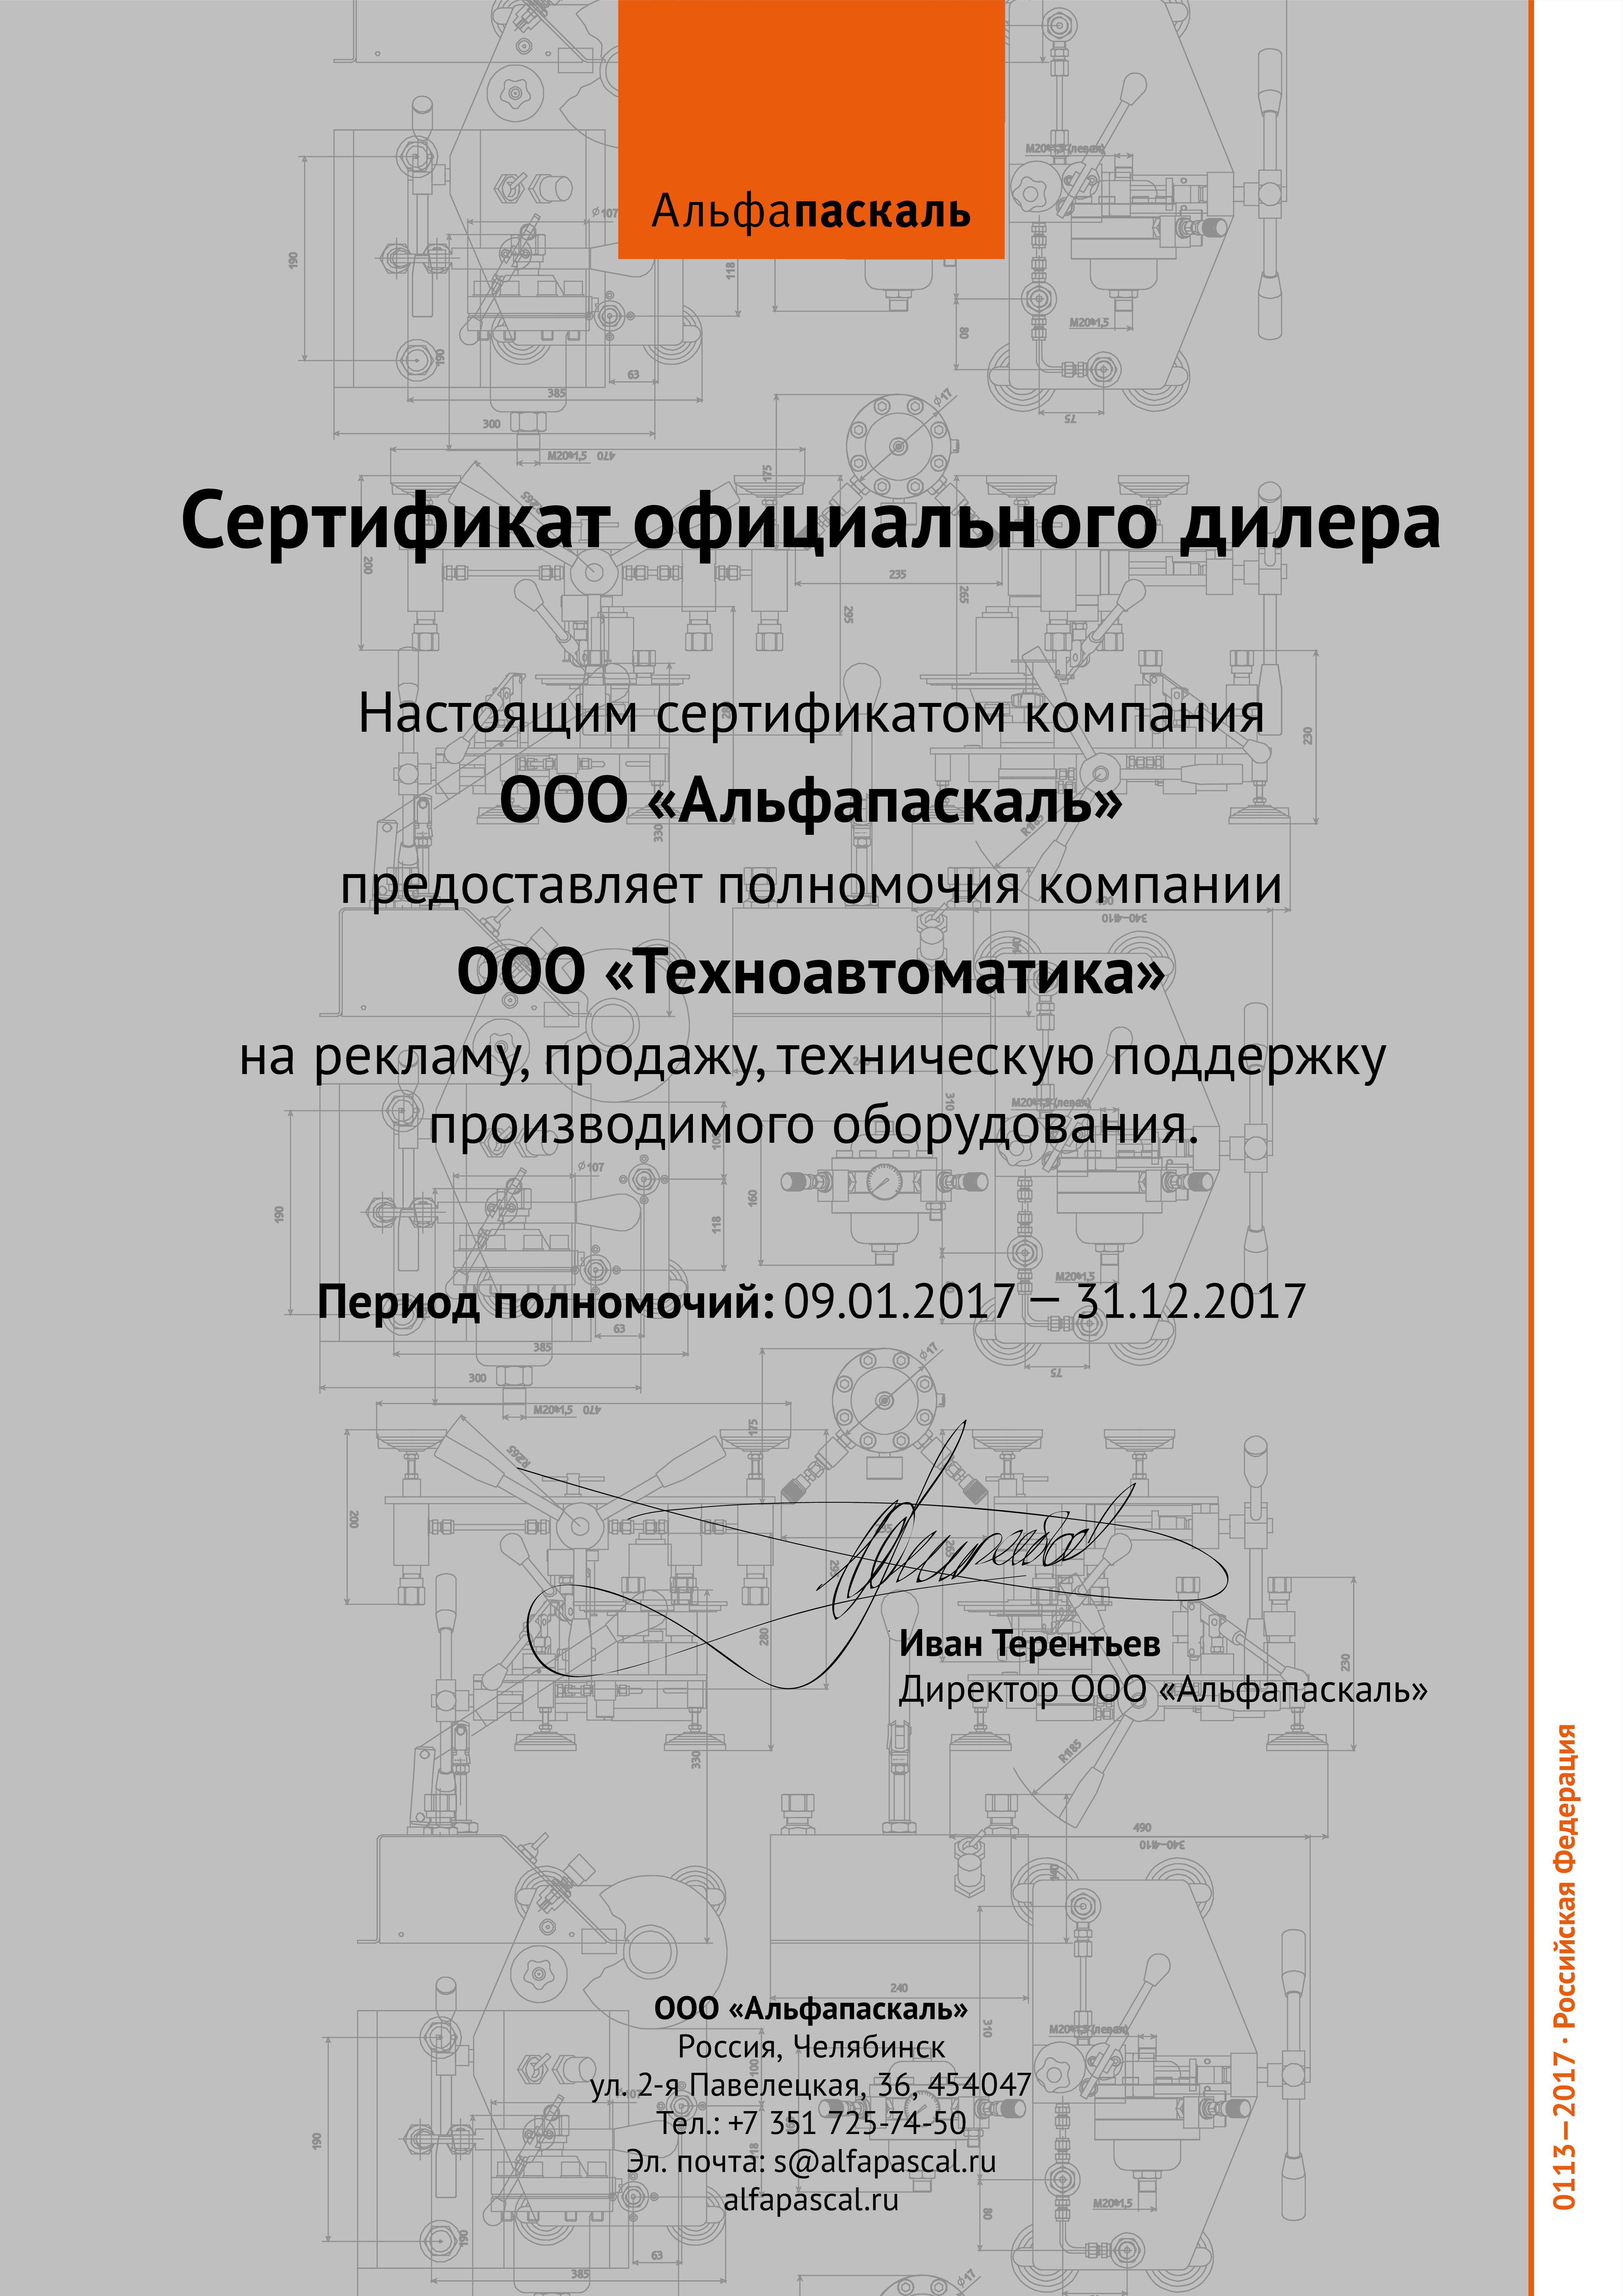 Сертификат дилера Техноавтоматика-2017